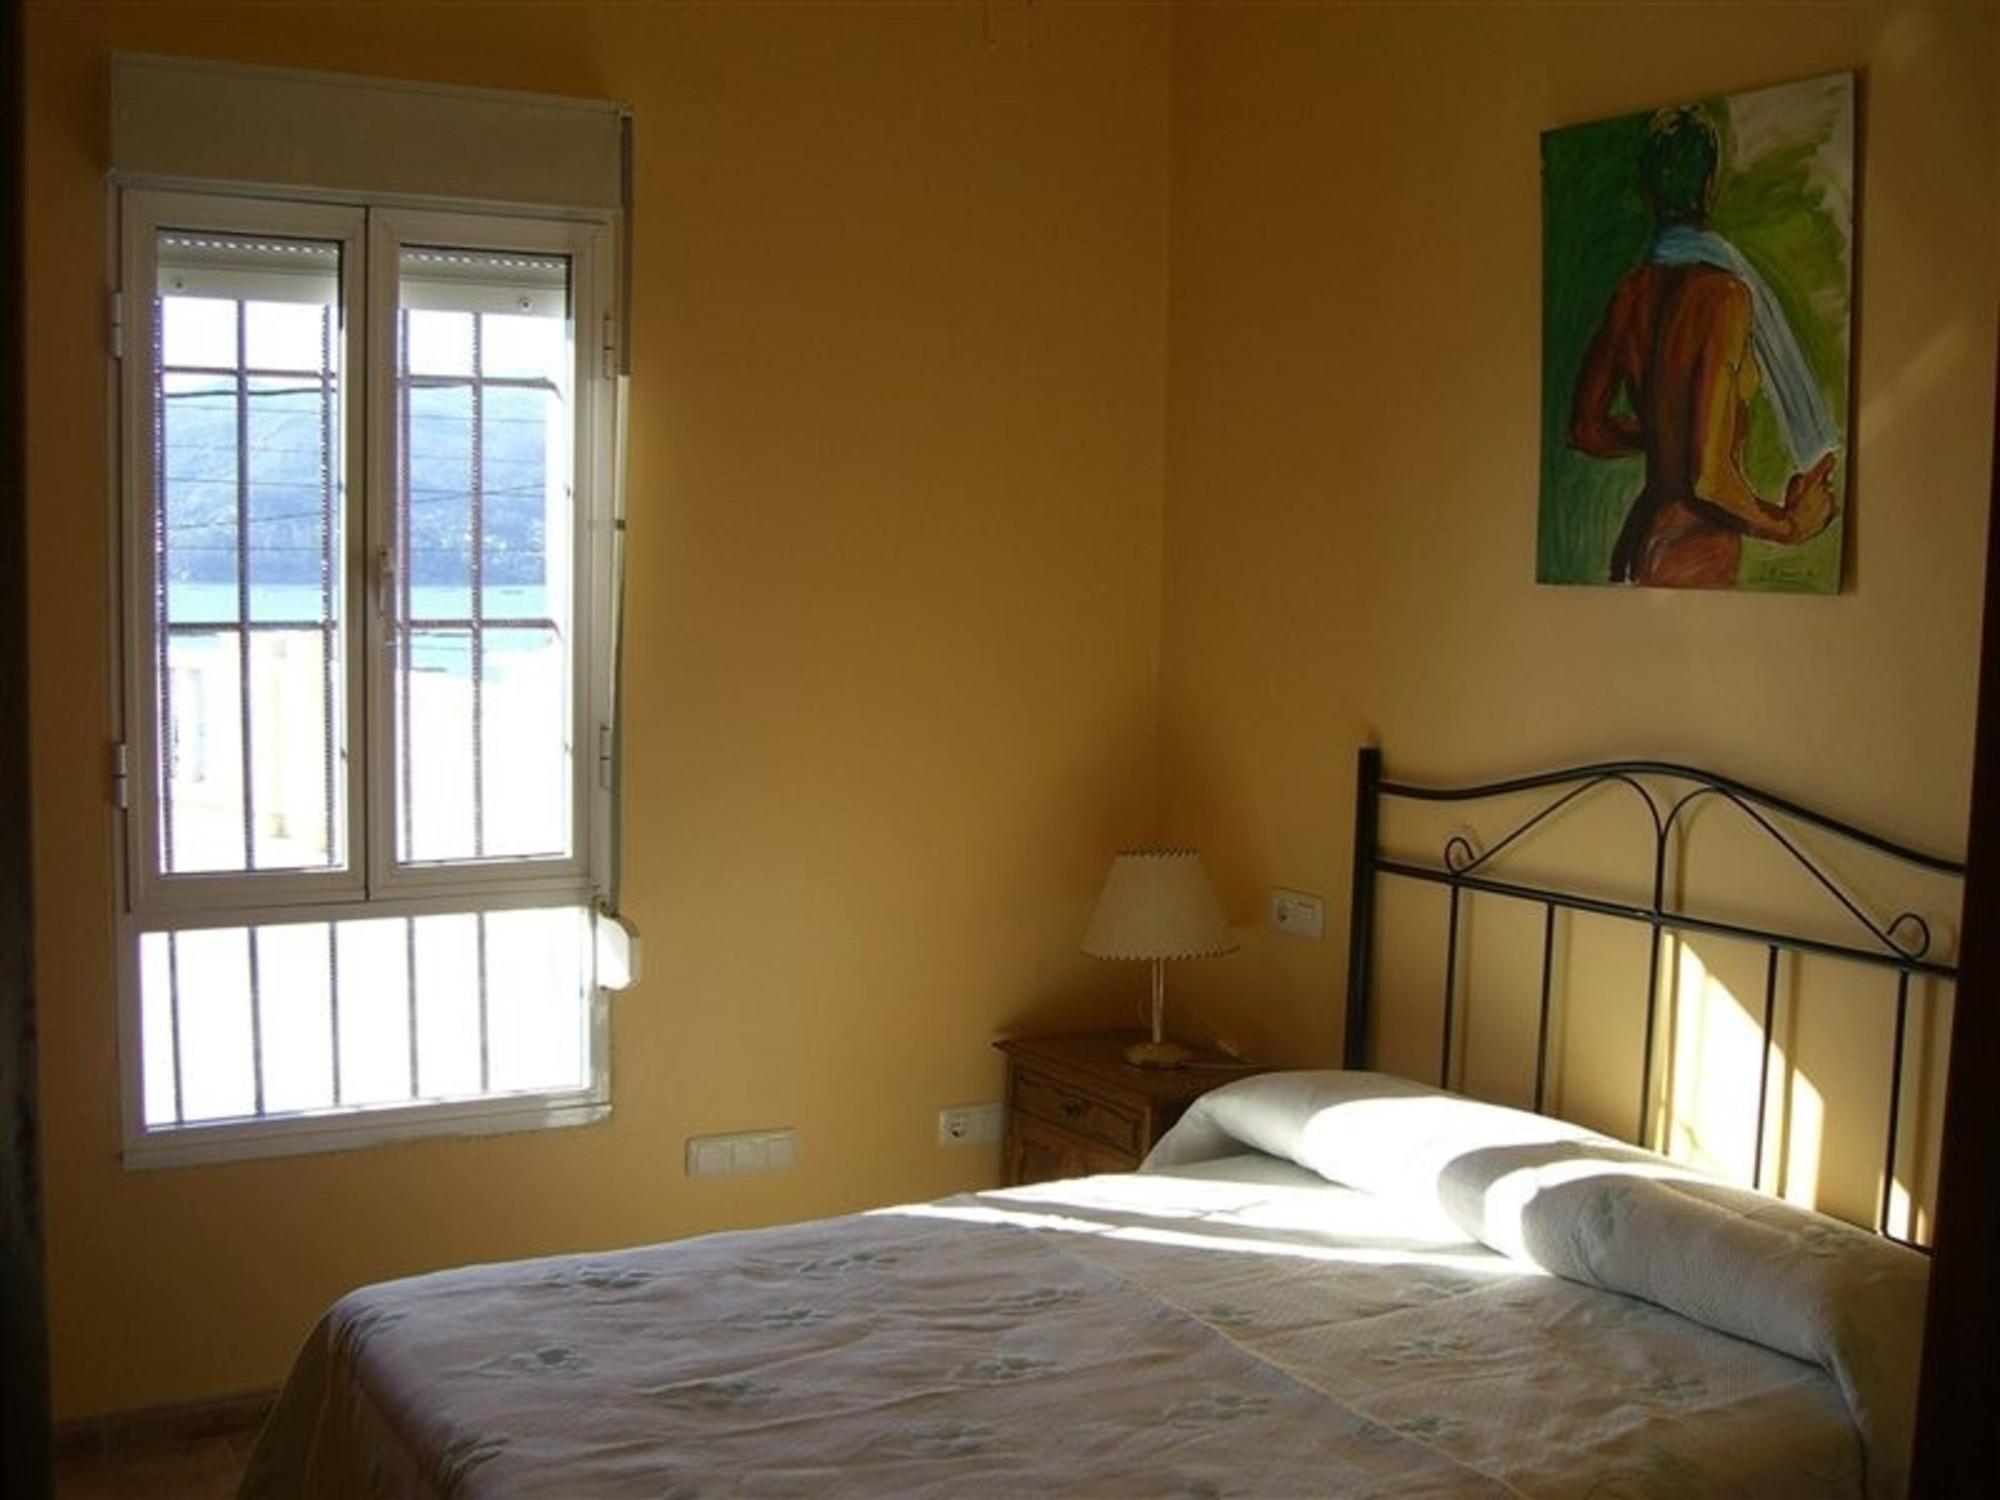 Ferienwohnung Apartment - 2 Bedrooms - 100119 (1937591), Vigo, Rias Bajas, Galicien, Spanien, Bild 6